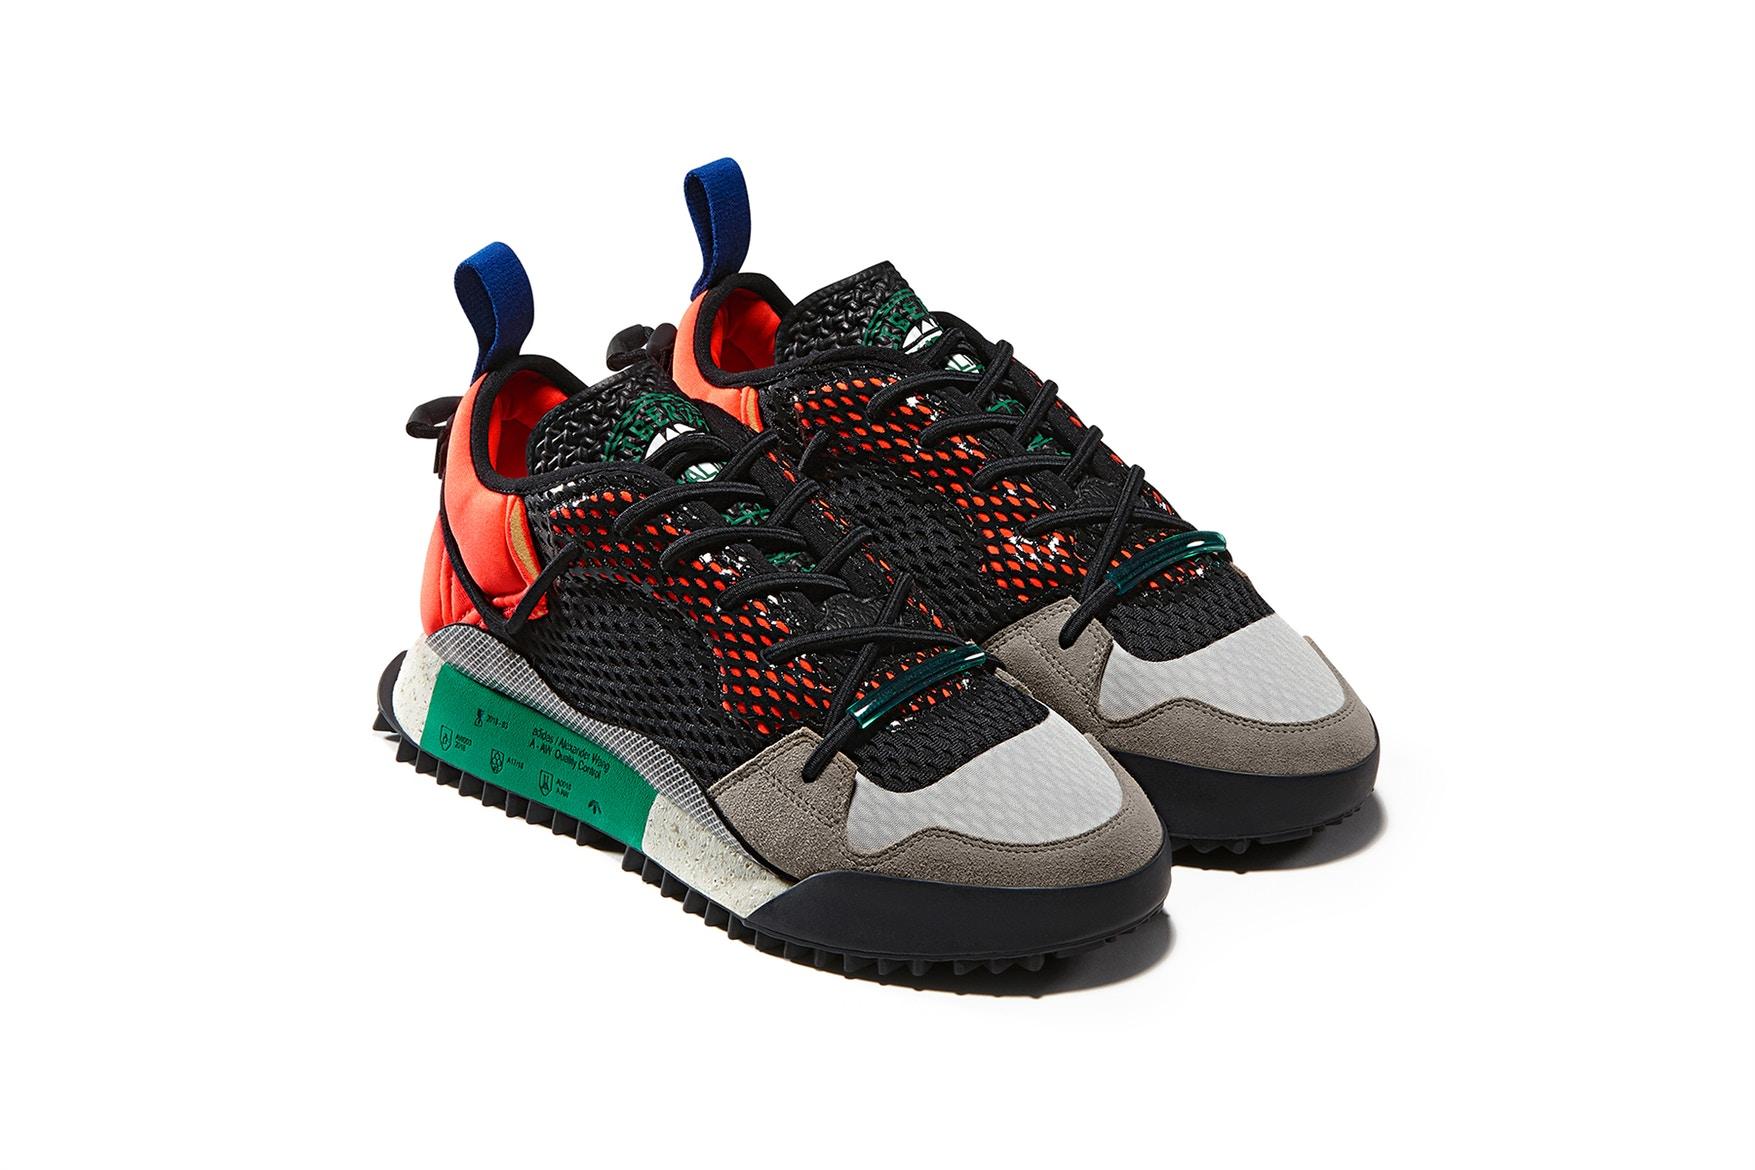 Alexander Wang & adidas Originals Back With More Summer Sportswear